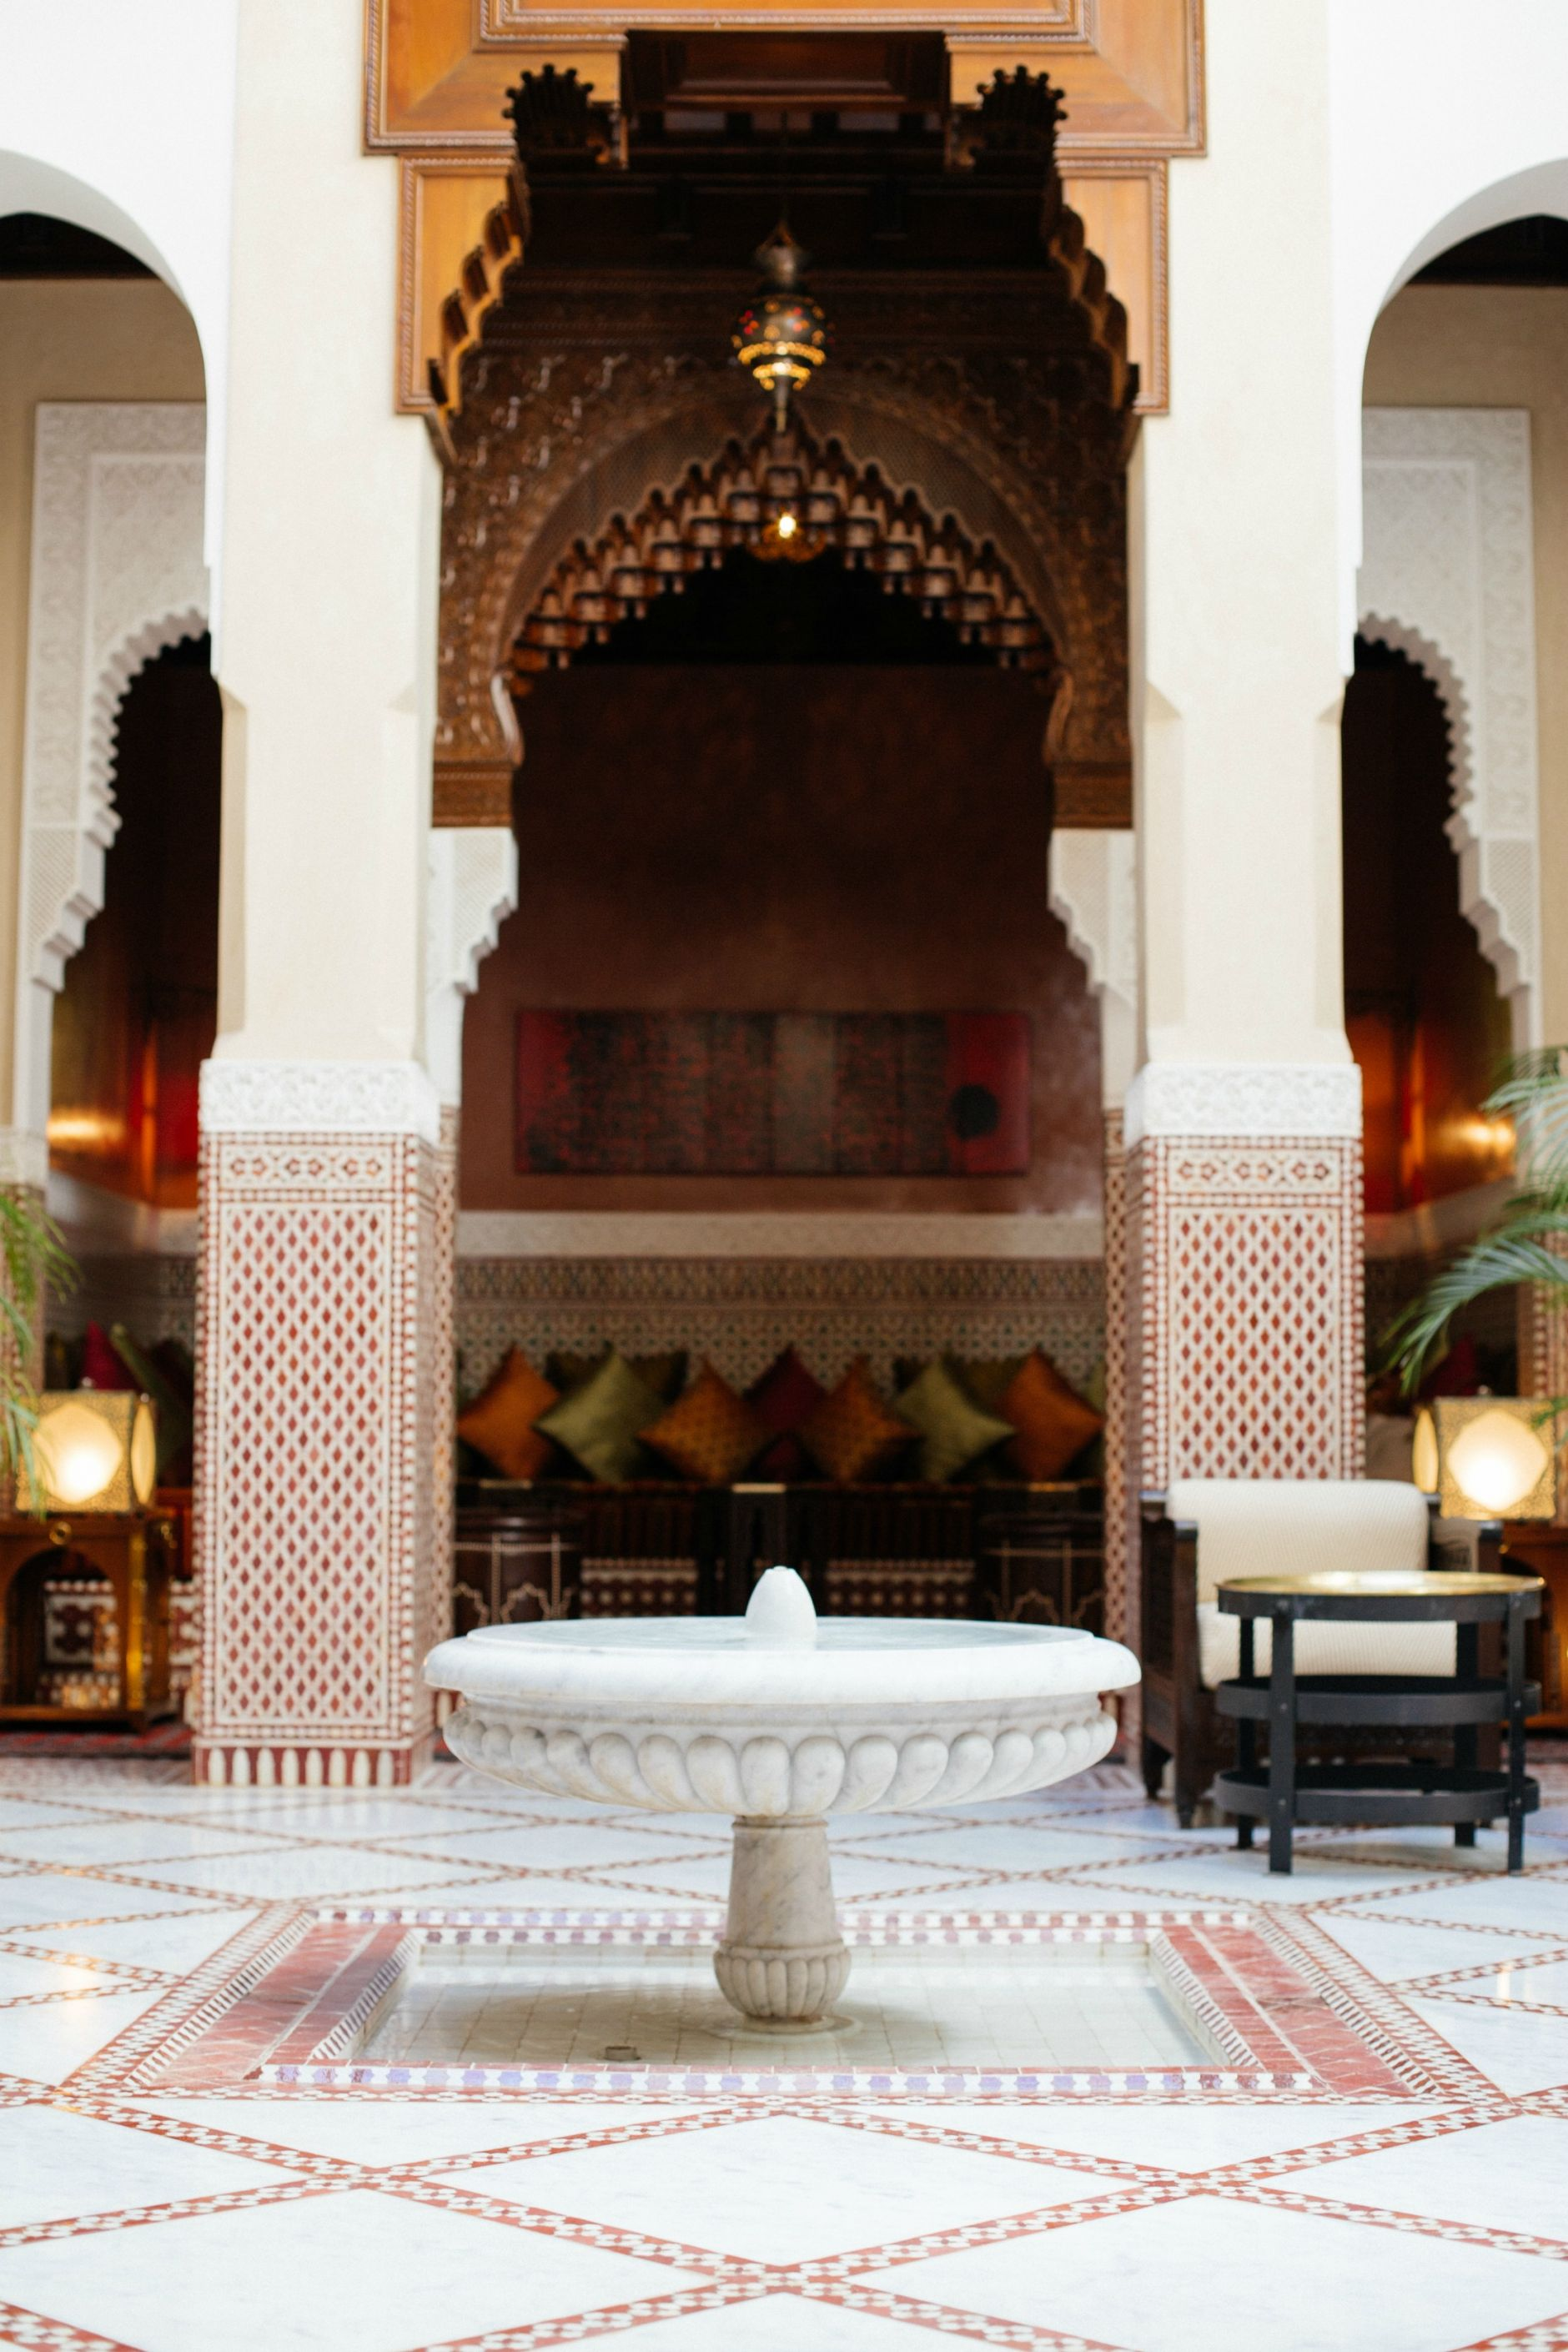 royal-mansour-hotel-luxury-marrakesch-marrakesh-morocco-edisa-shahini-disicouture-blog-31